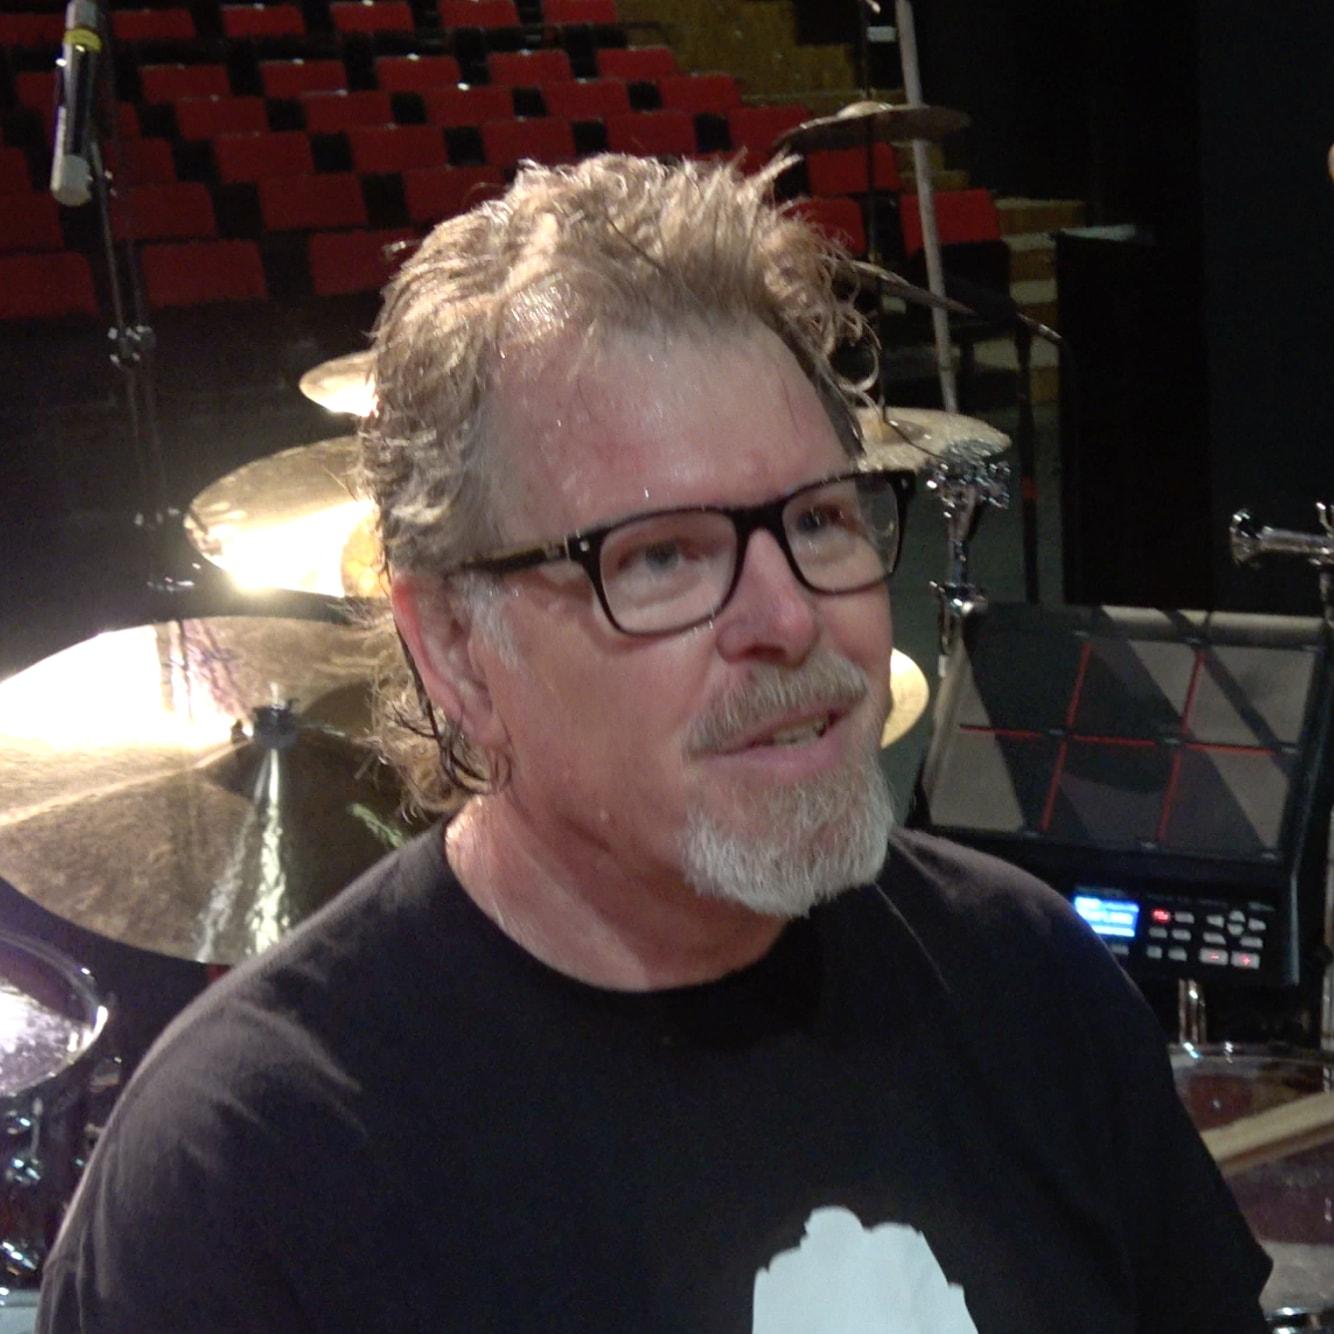 Pat Mastelotto presents his drum kit en.beatit.tv